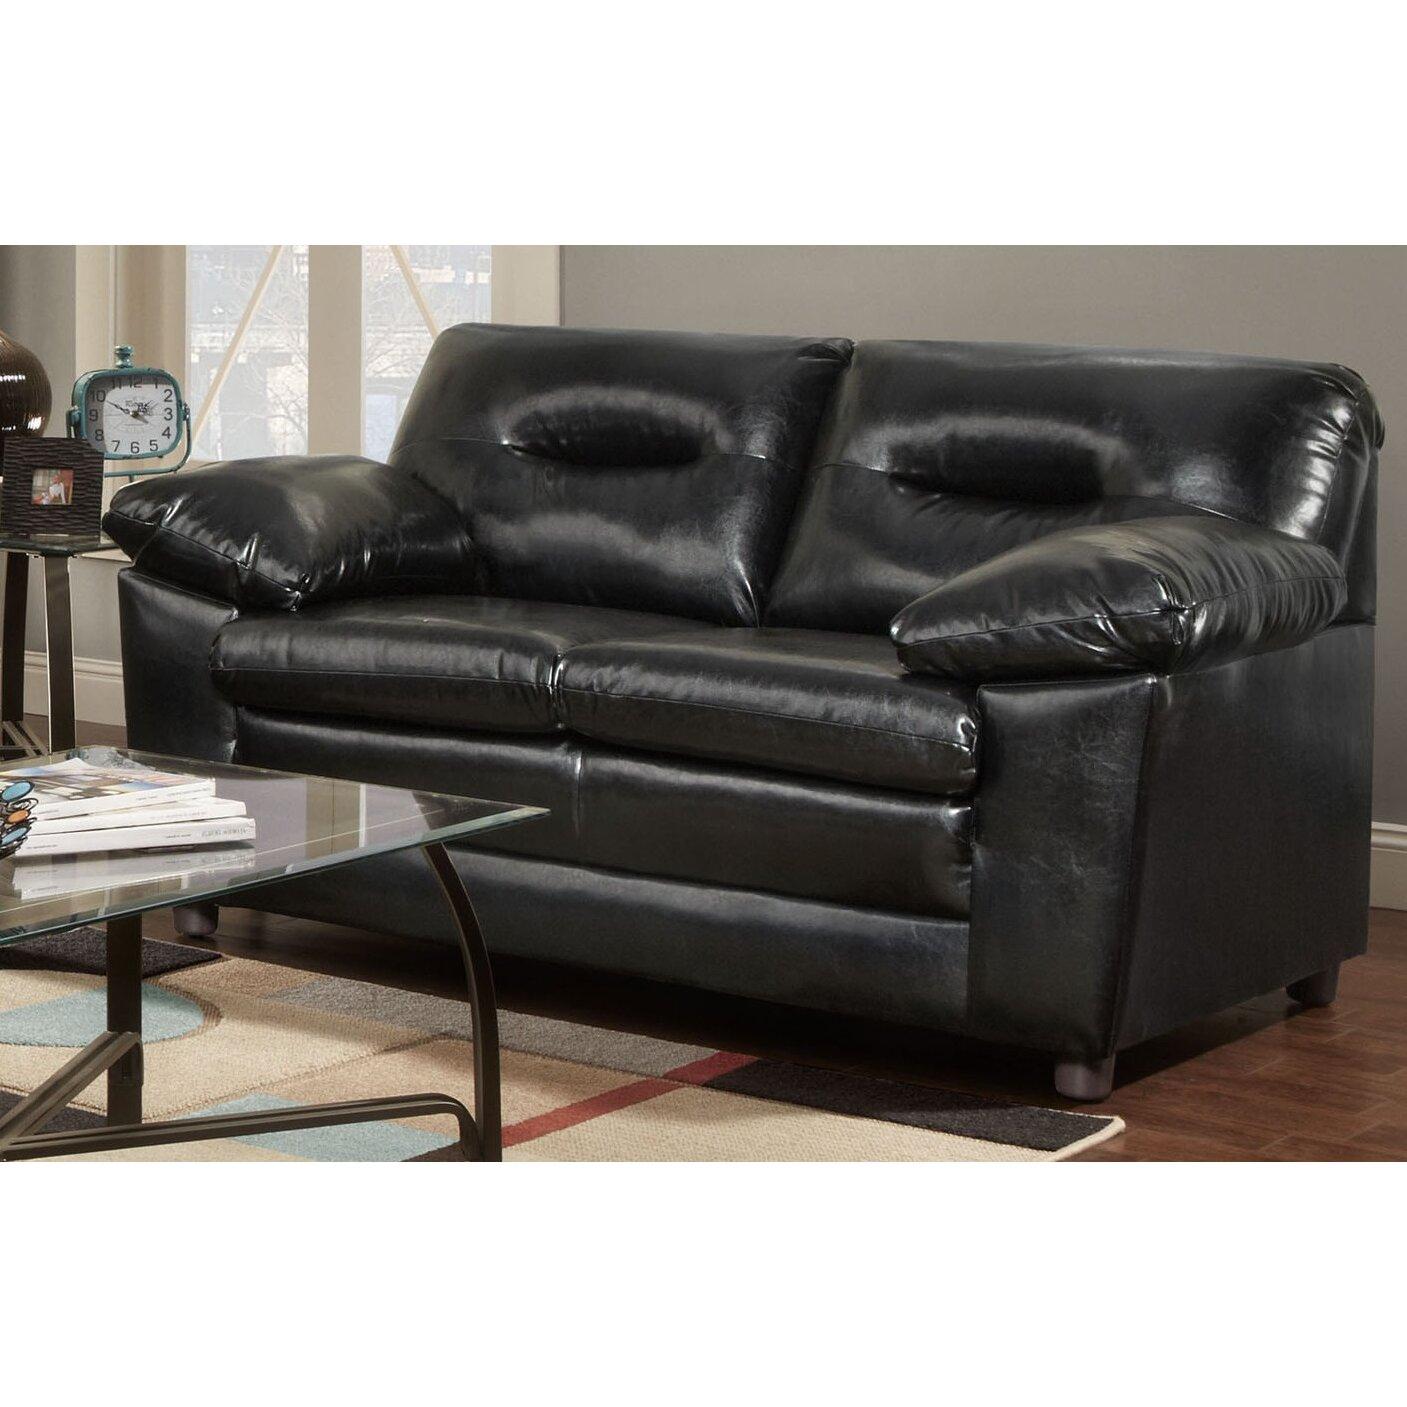 Chelsea home furniture northampton loveseat reviews for Furniture northampton